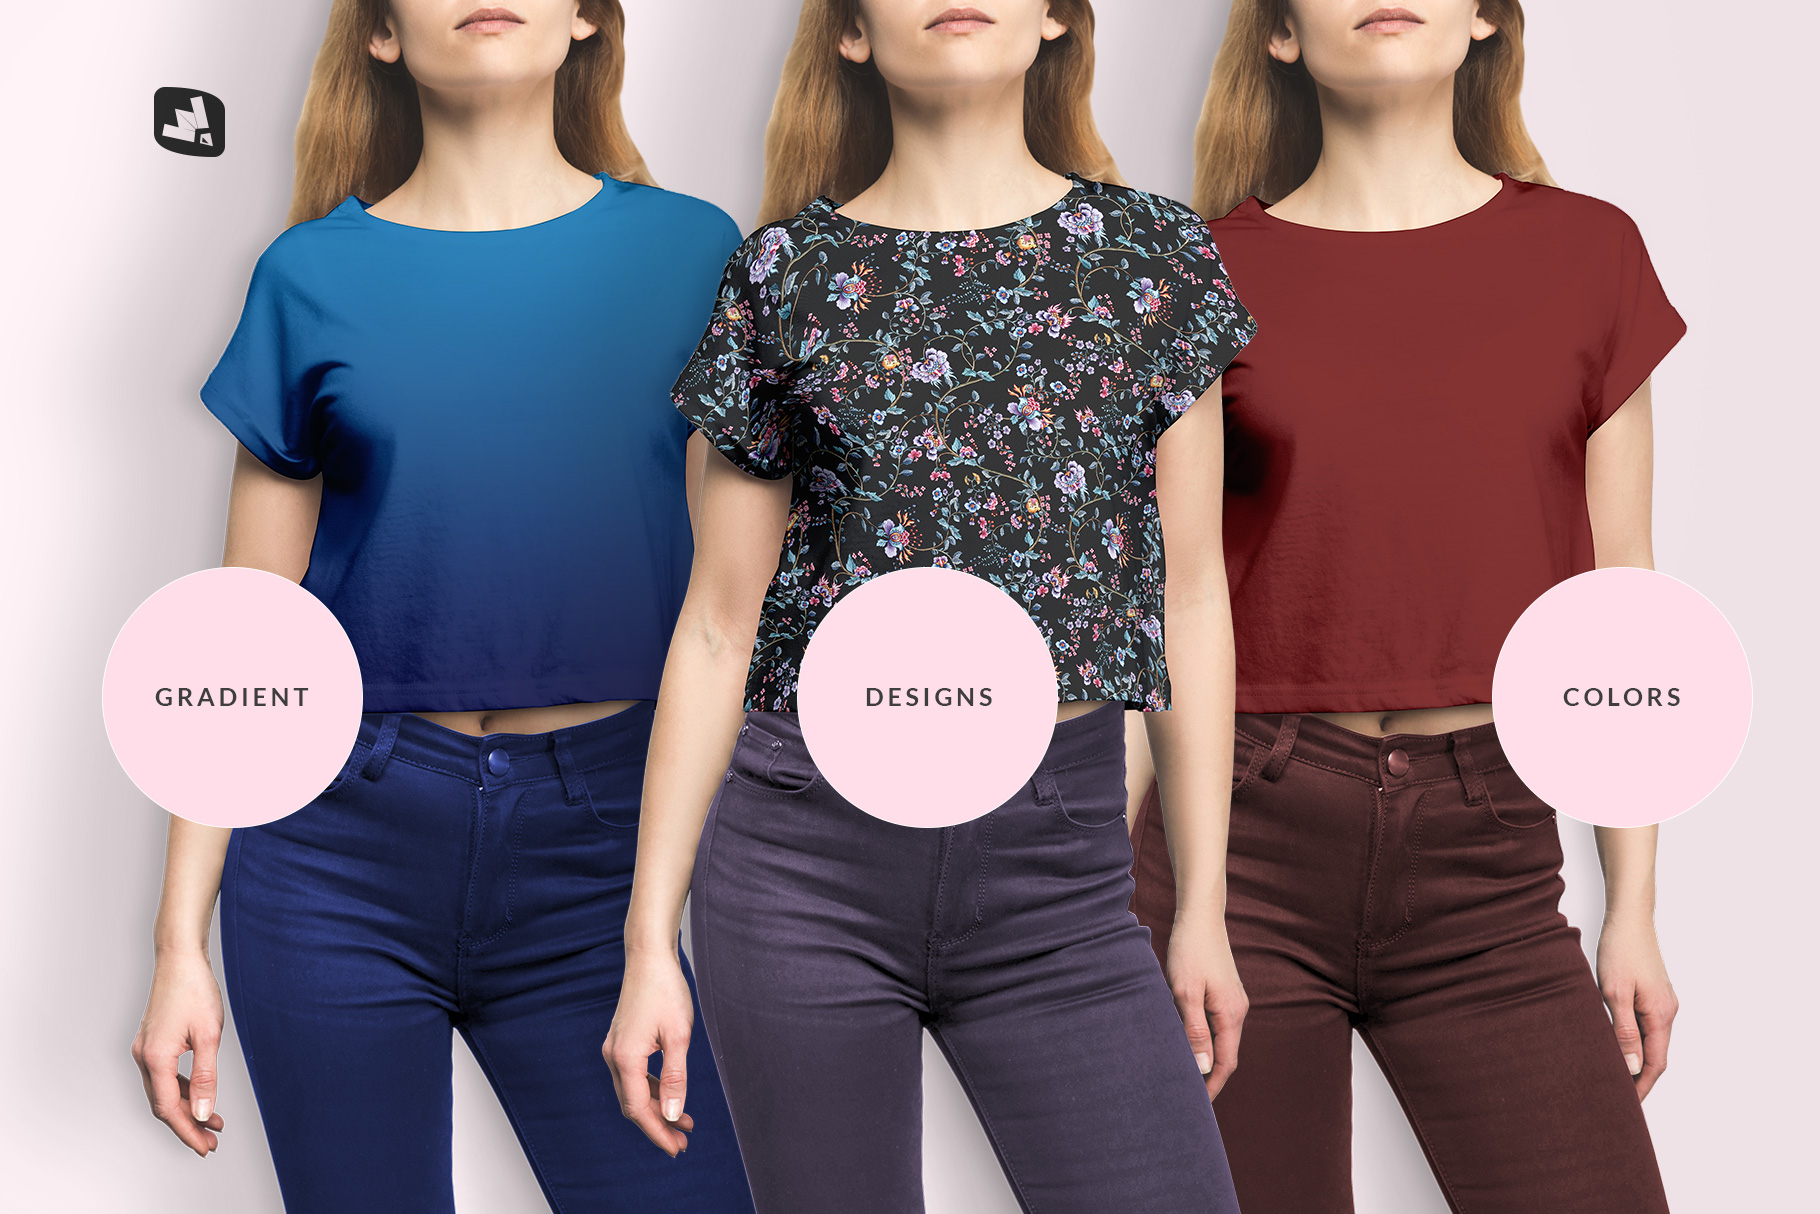 types of the female crop top tshirt mockup